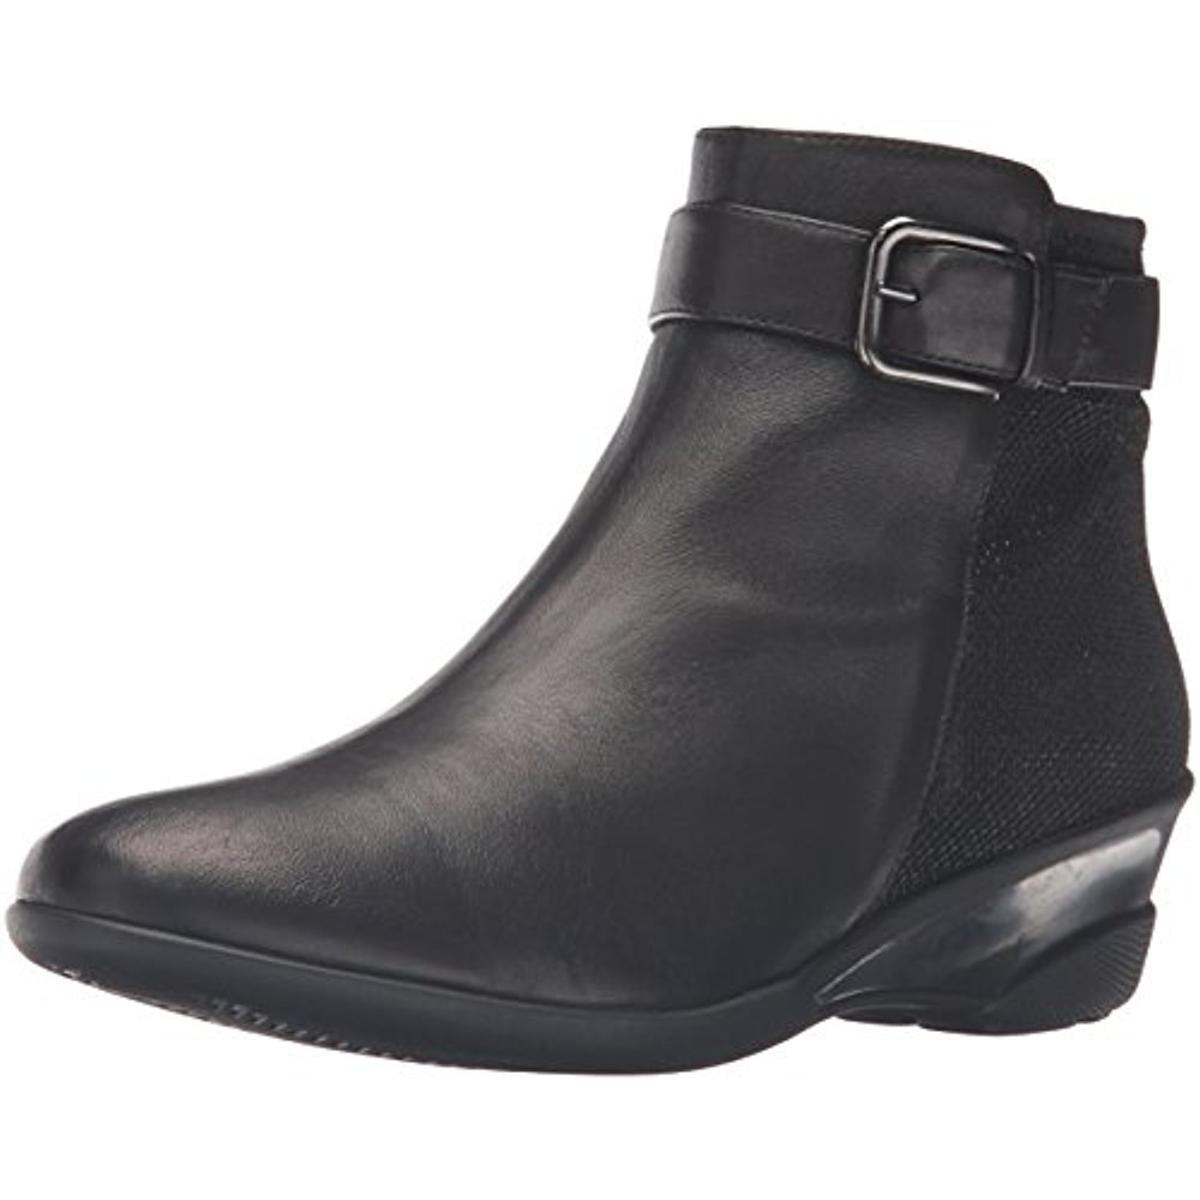 Amalfi by Rangoni Womens Nizza Leather Metallic Ankle Boots by Amalfi by Rangoni